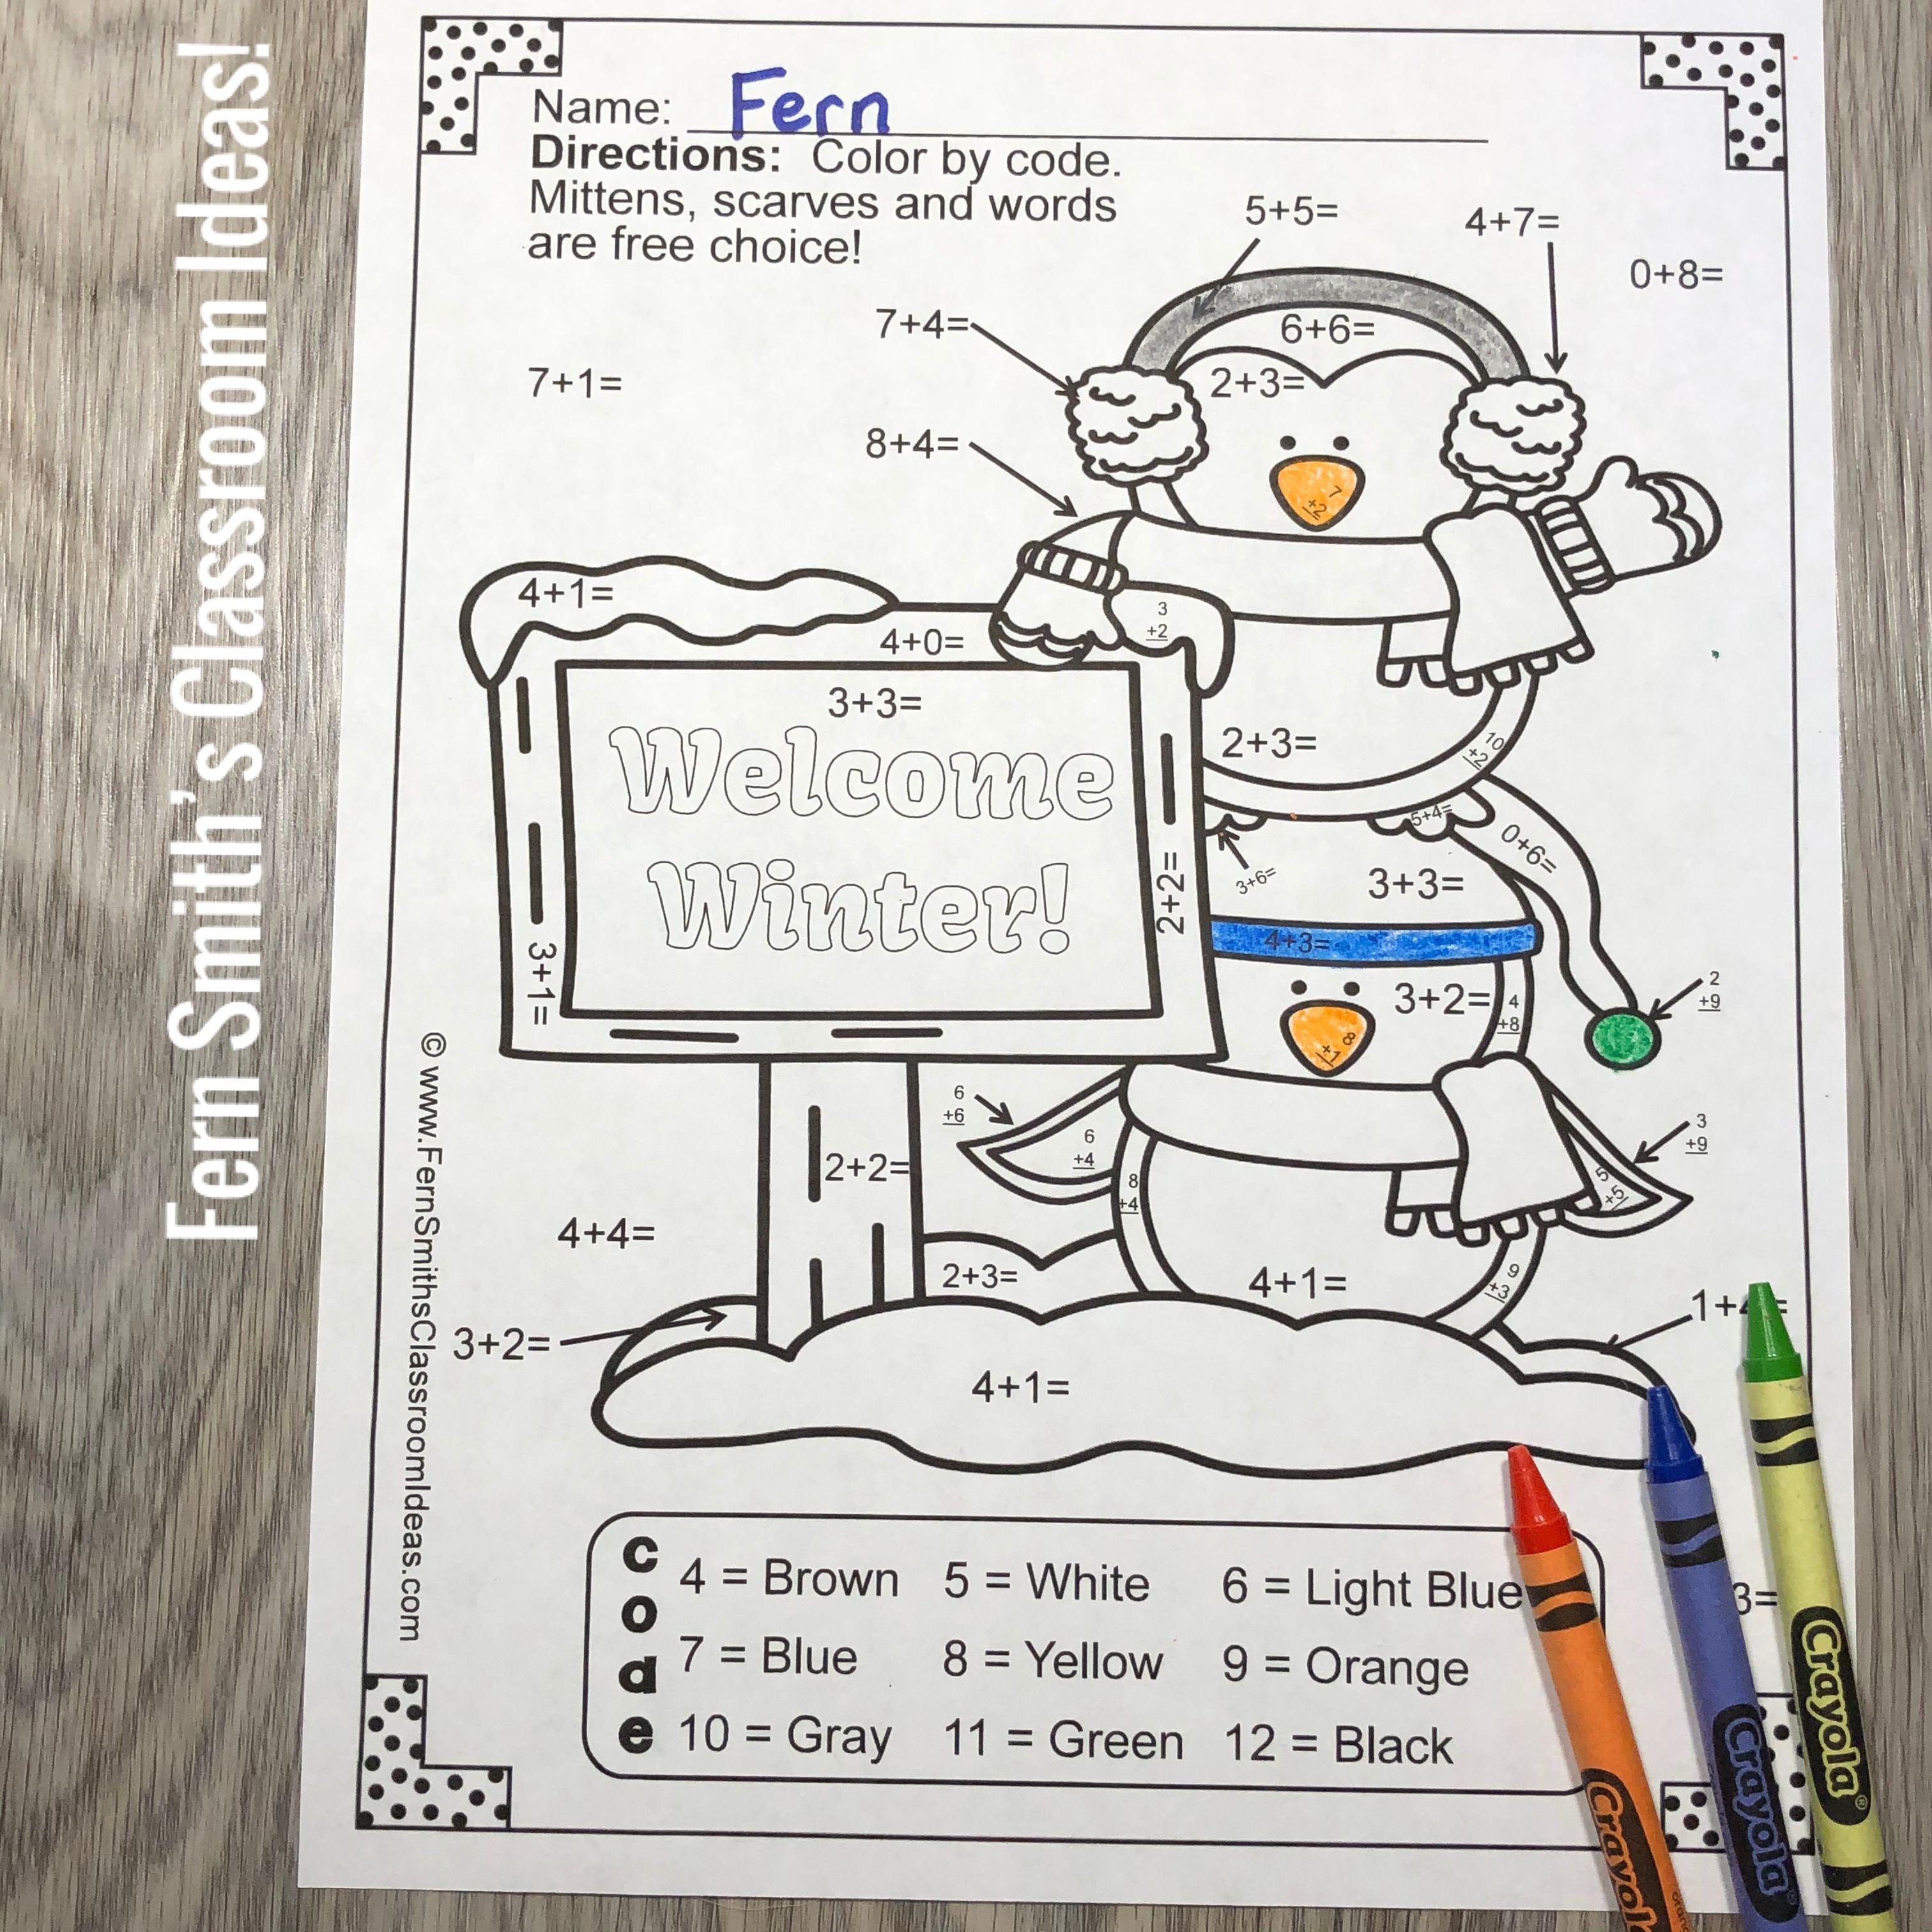 Winter Color By Number Addition And Subtraction Bundle Coloring Worksheets For Kindergarten Addition And Subtraction Fern Smith S Classroom Ideas [ 3024 x 3024 Pixel ]